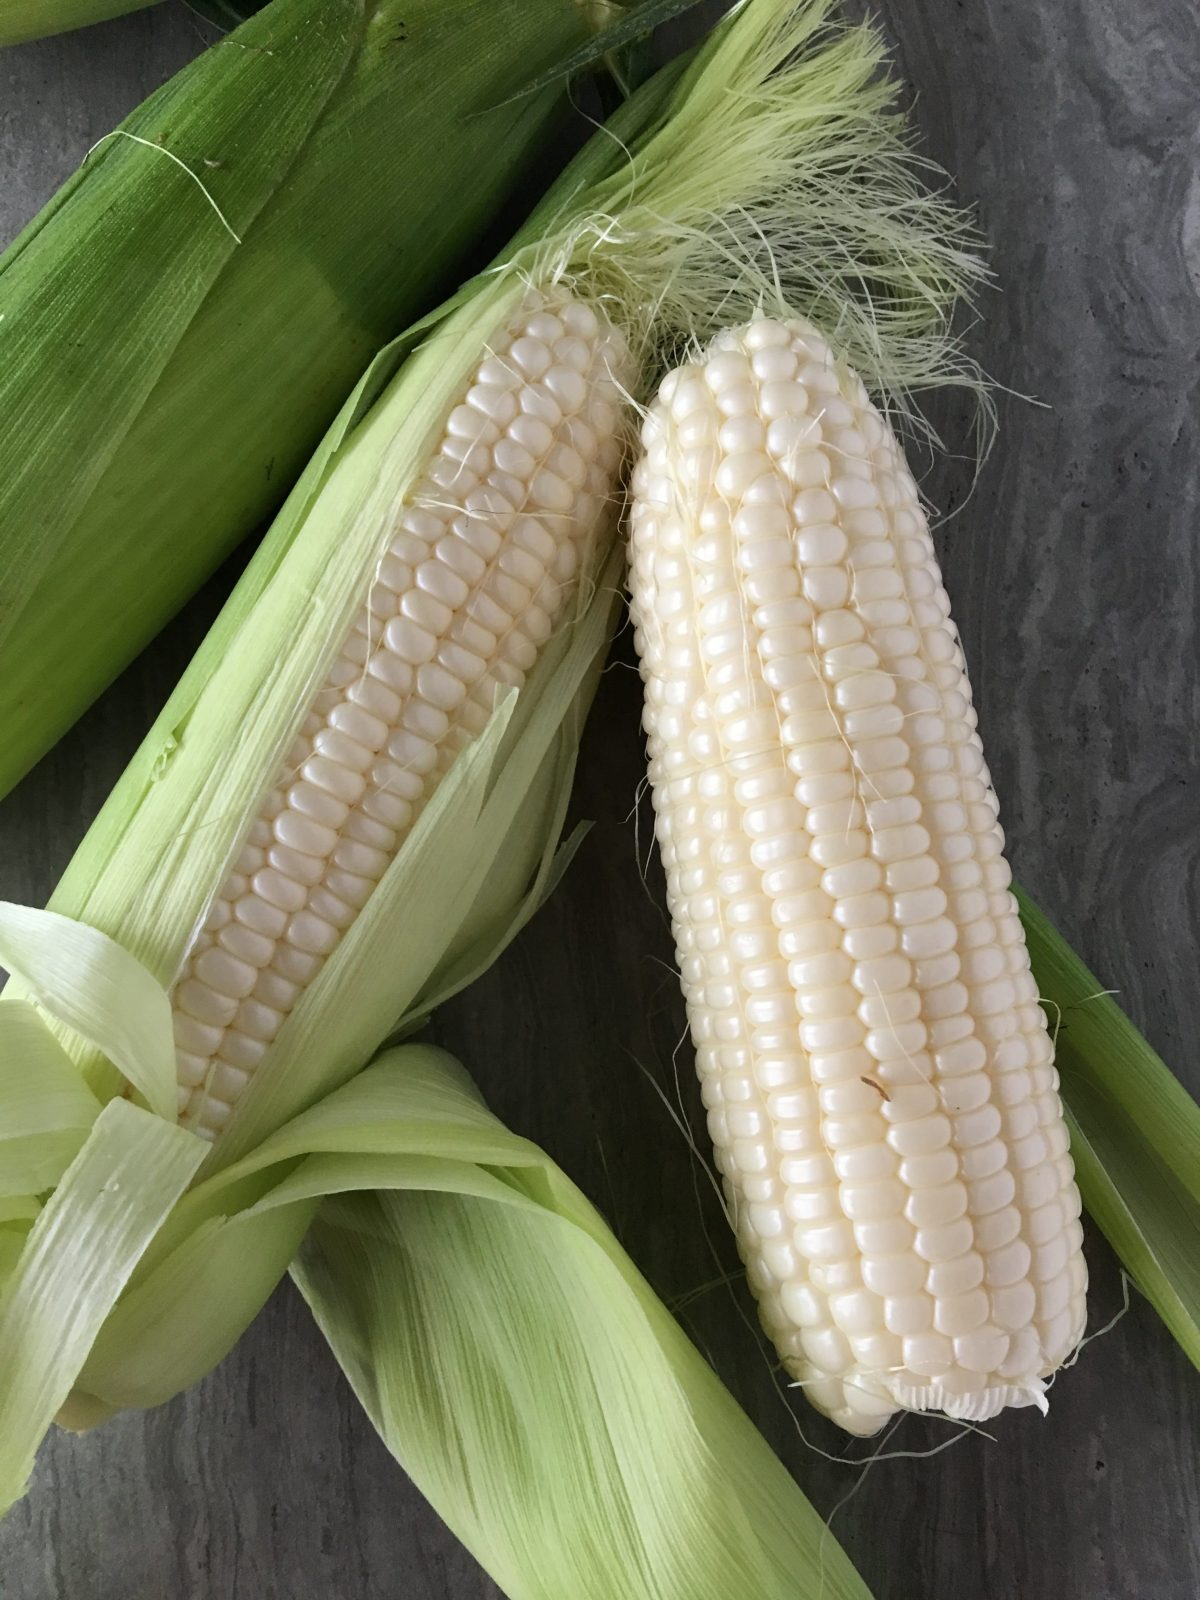 corn recipes on www.virginiawillis.com